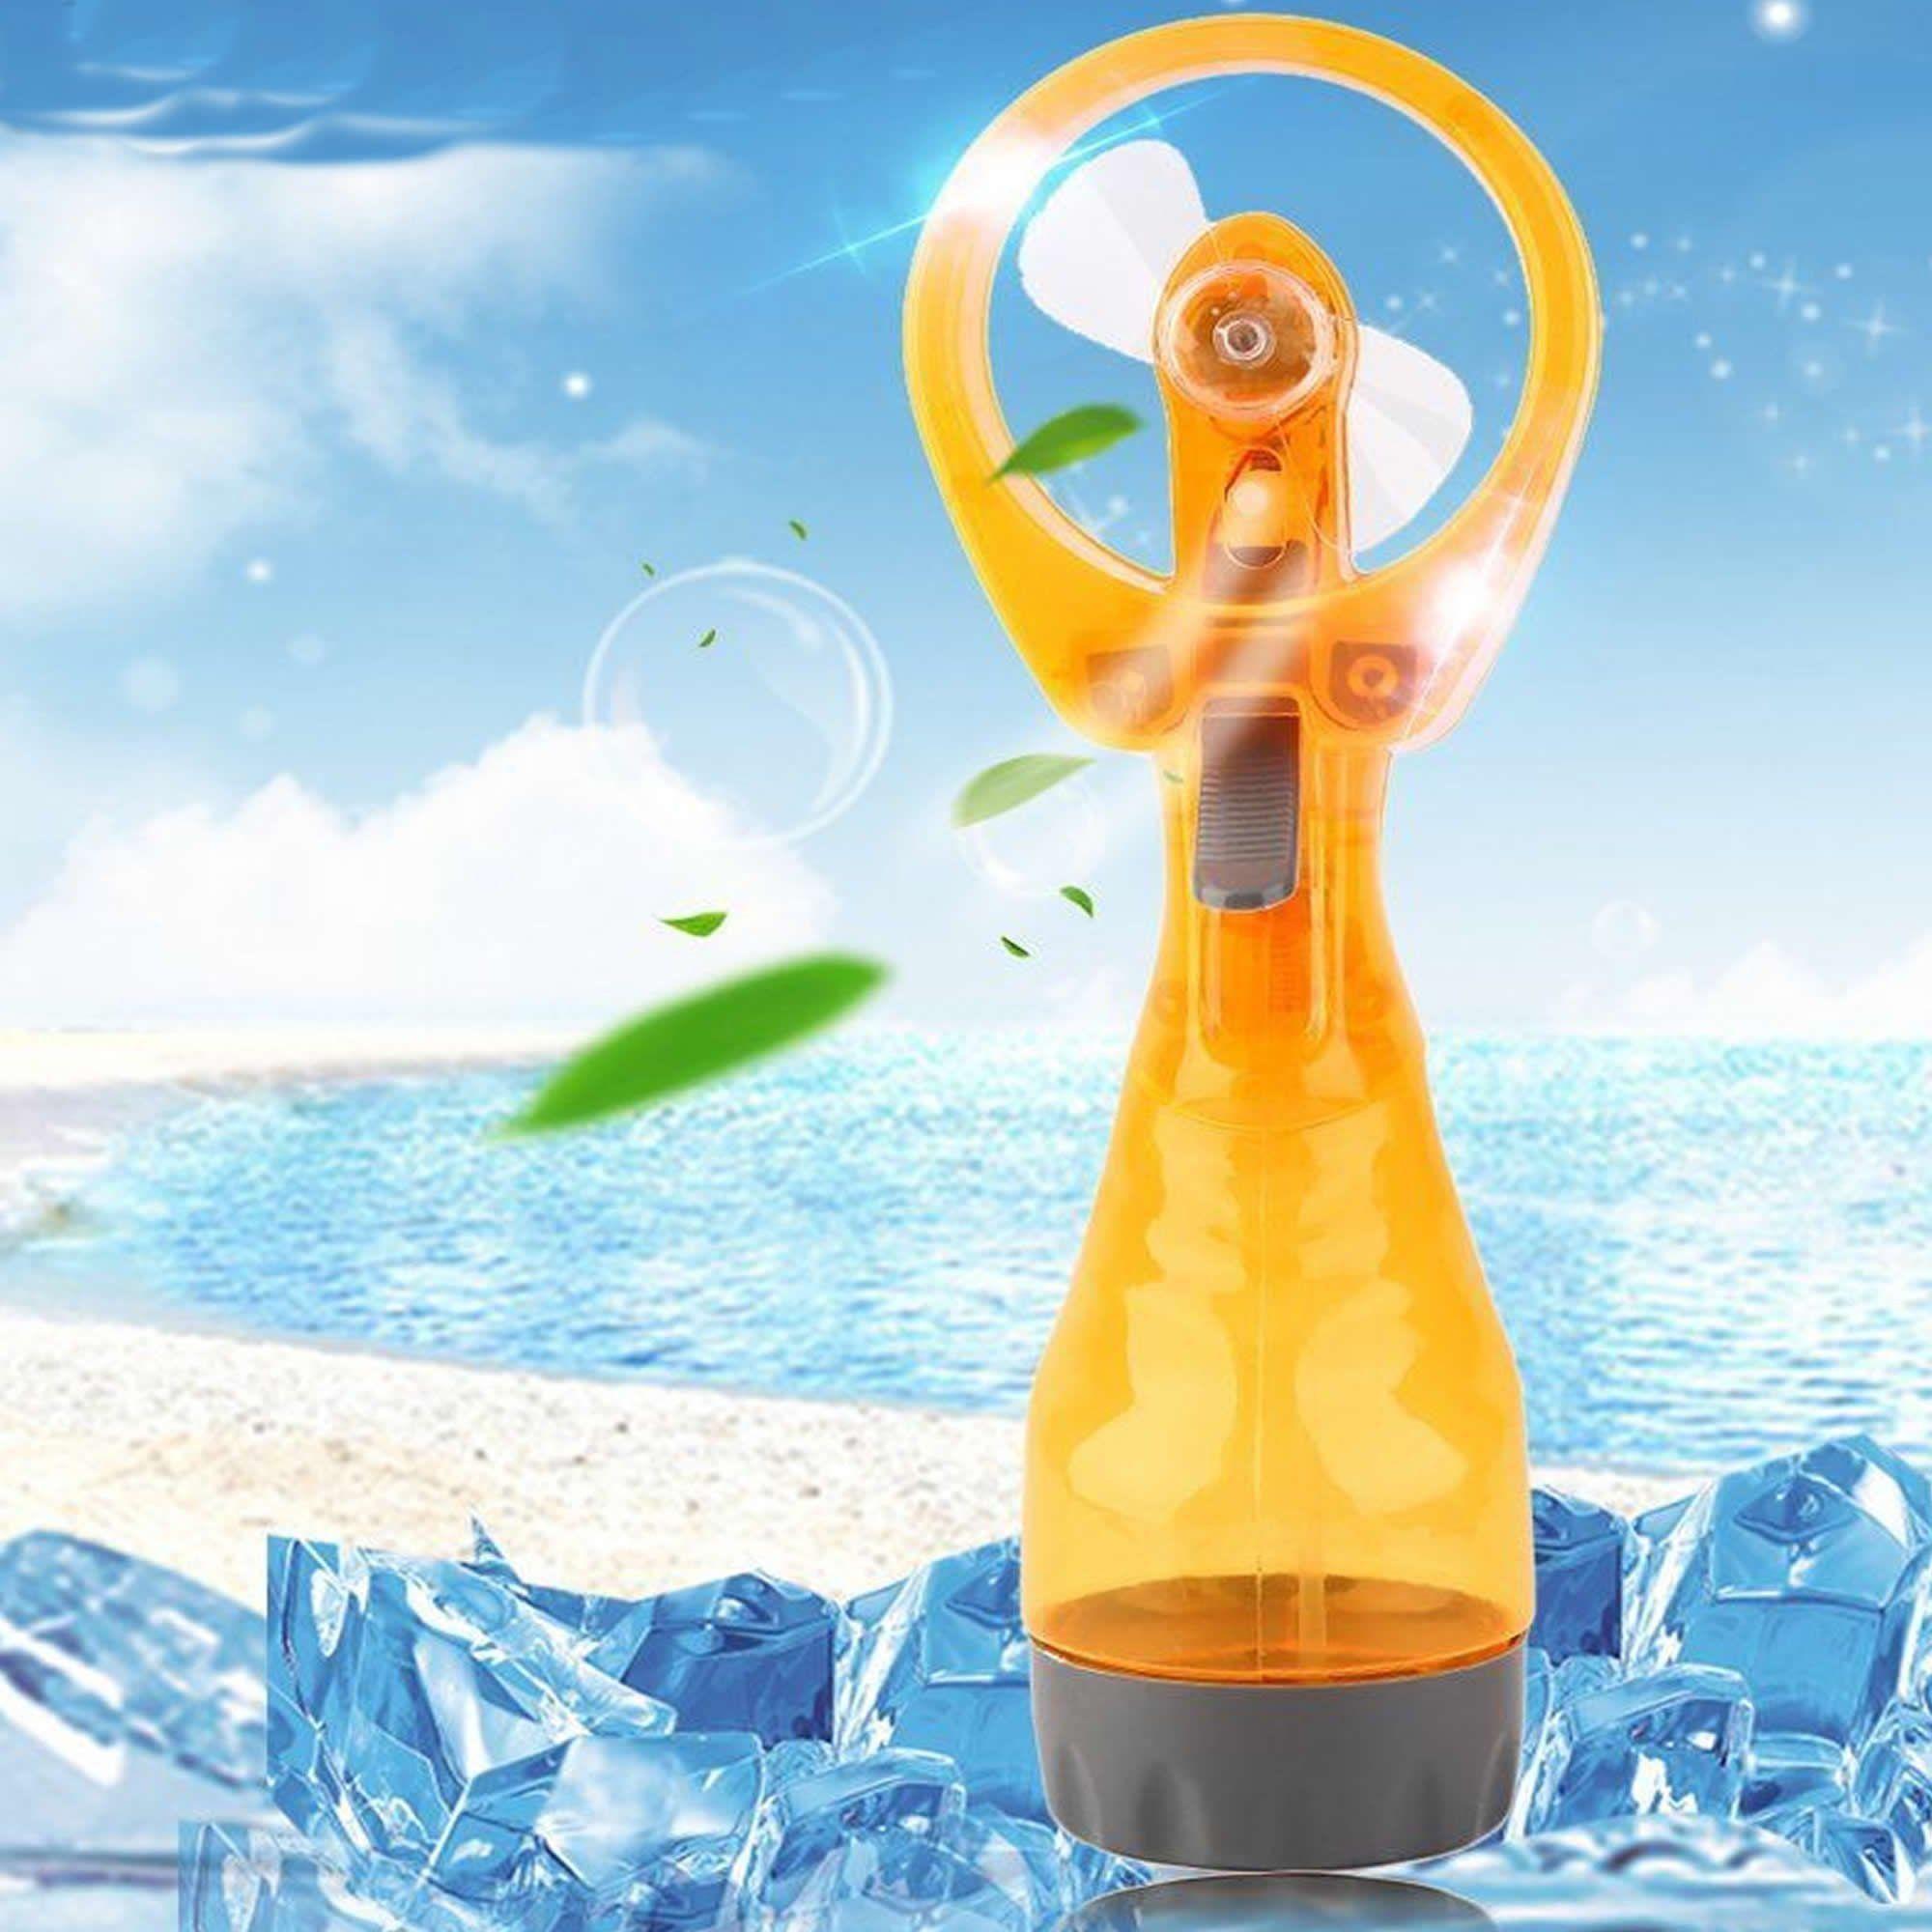 Ventilador Portátil Borrifador Umidificador Spray Amarelo CBRN05161